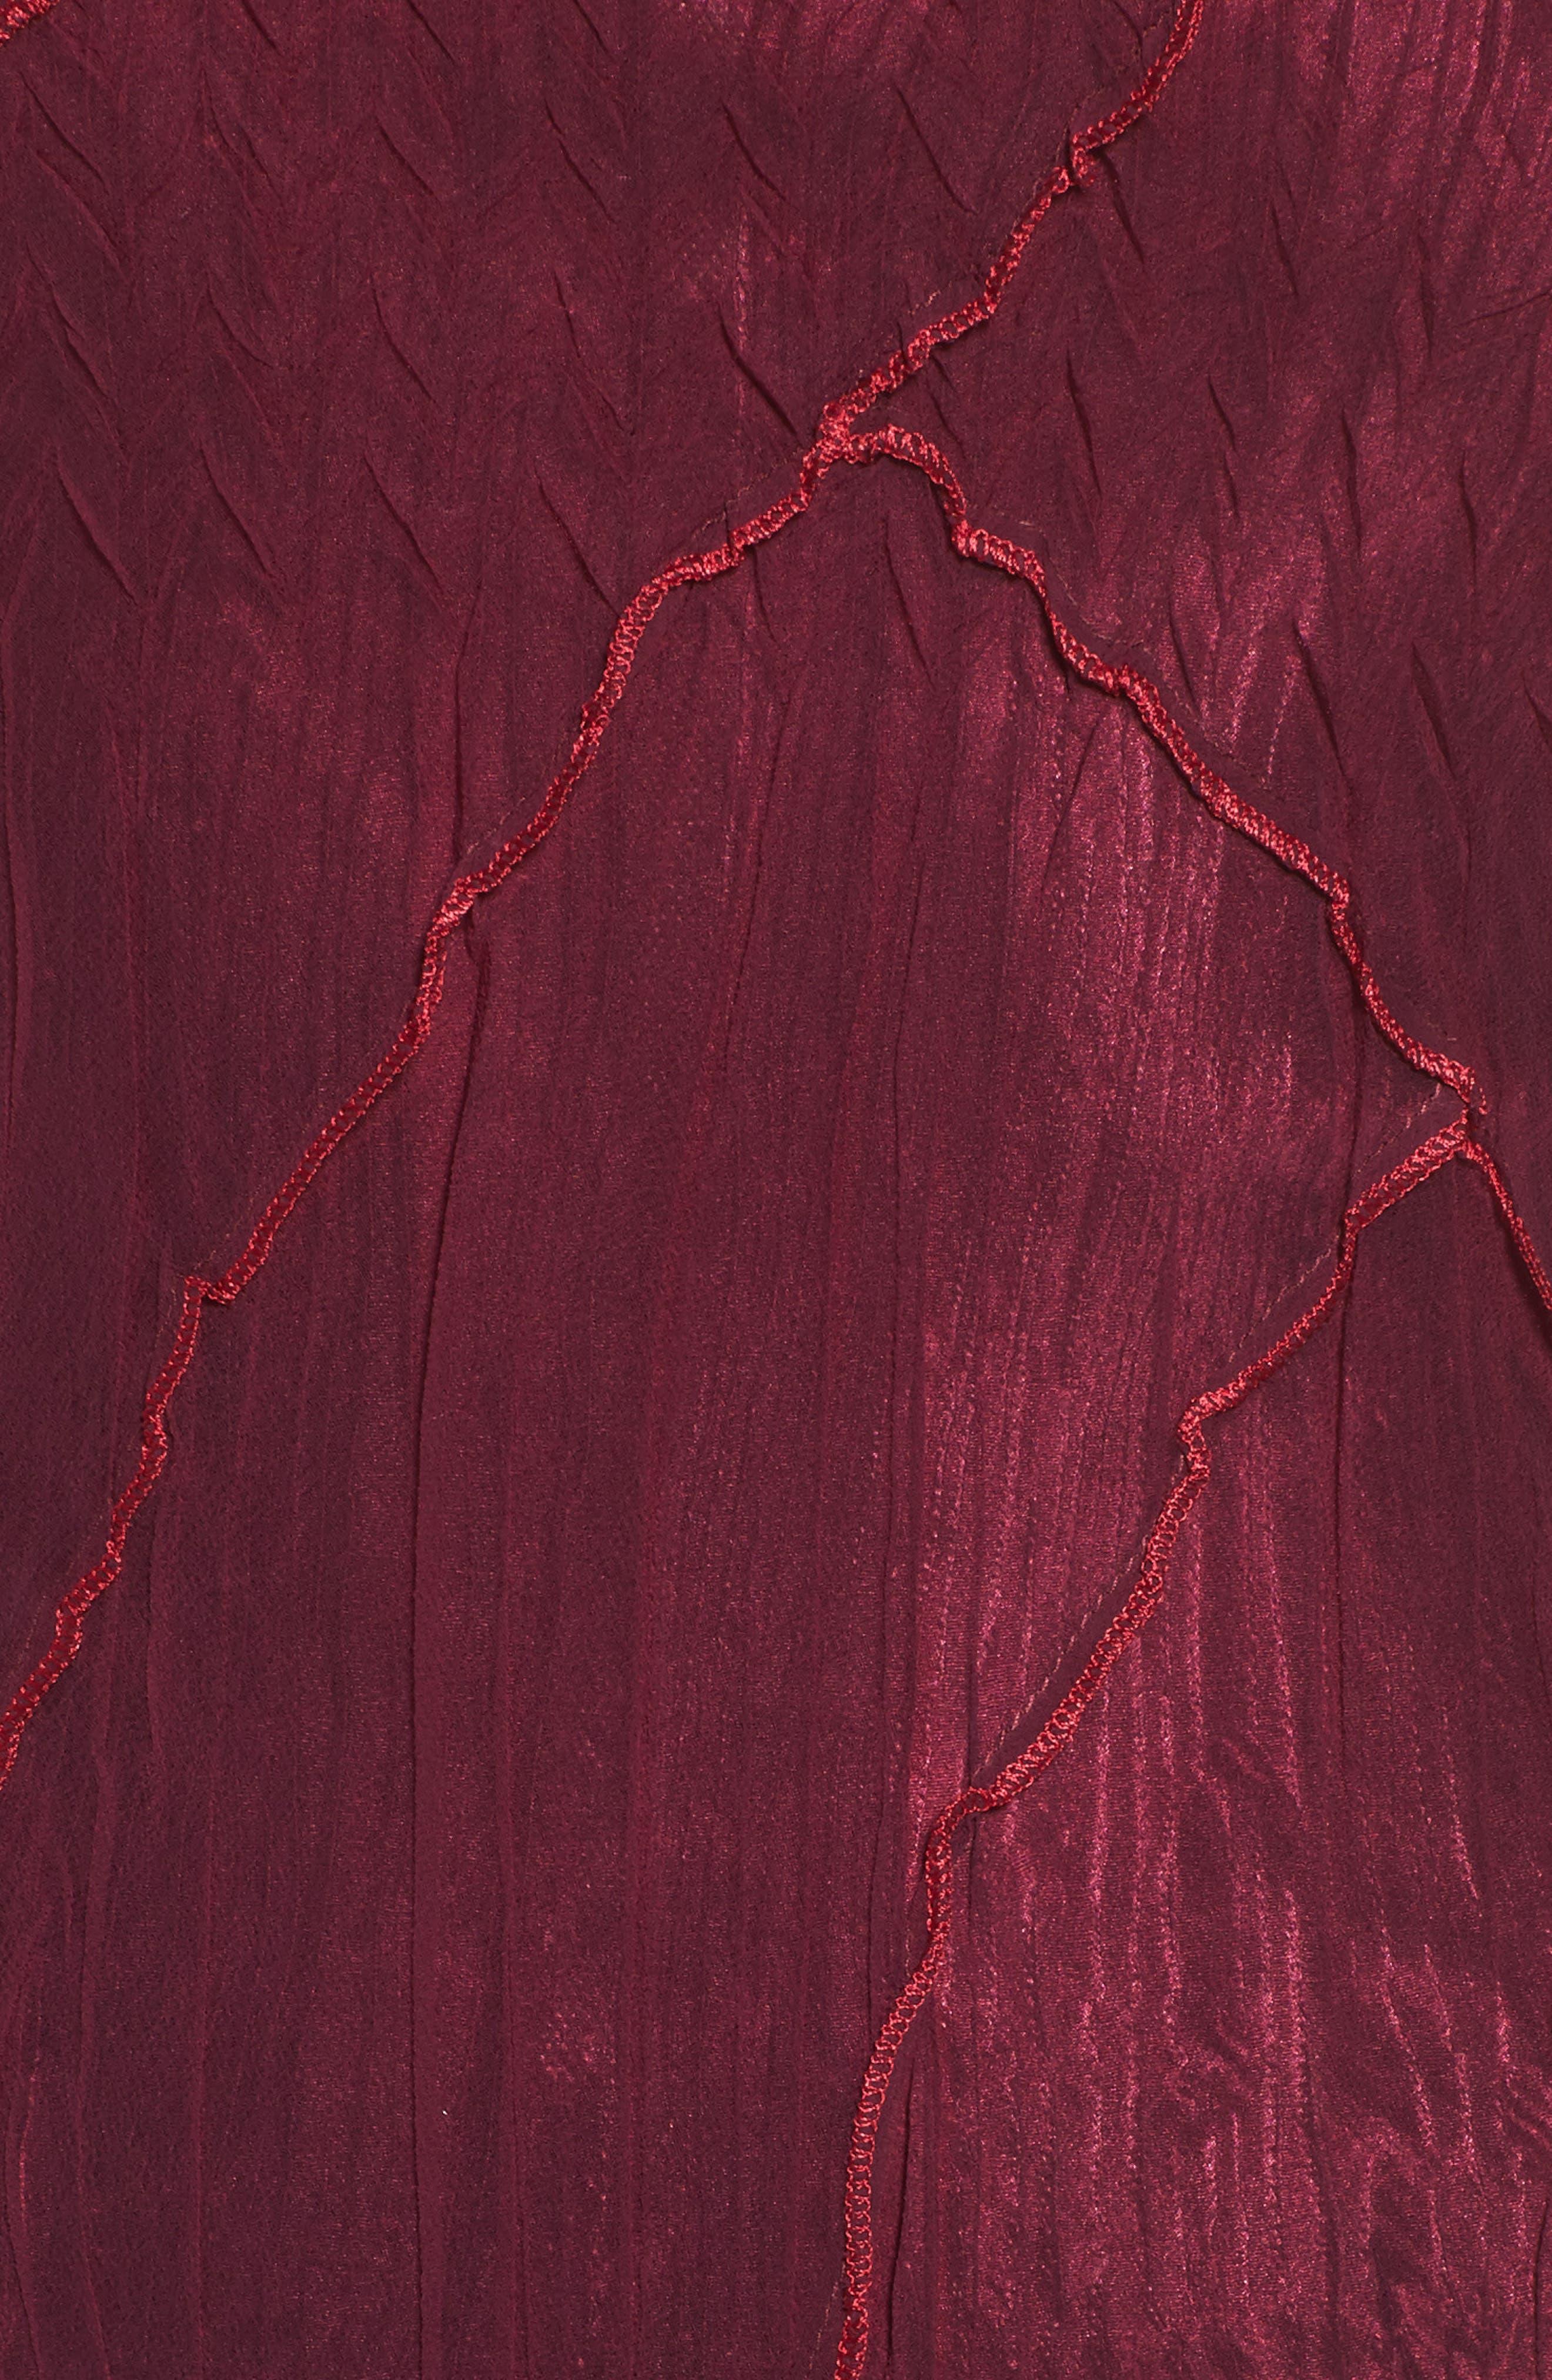 Chiffon A-Line Dress,                             Alternate thumbnail 5, color,                             Red Plum Blue Ombre